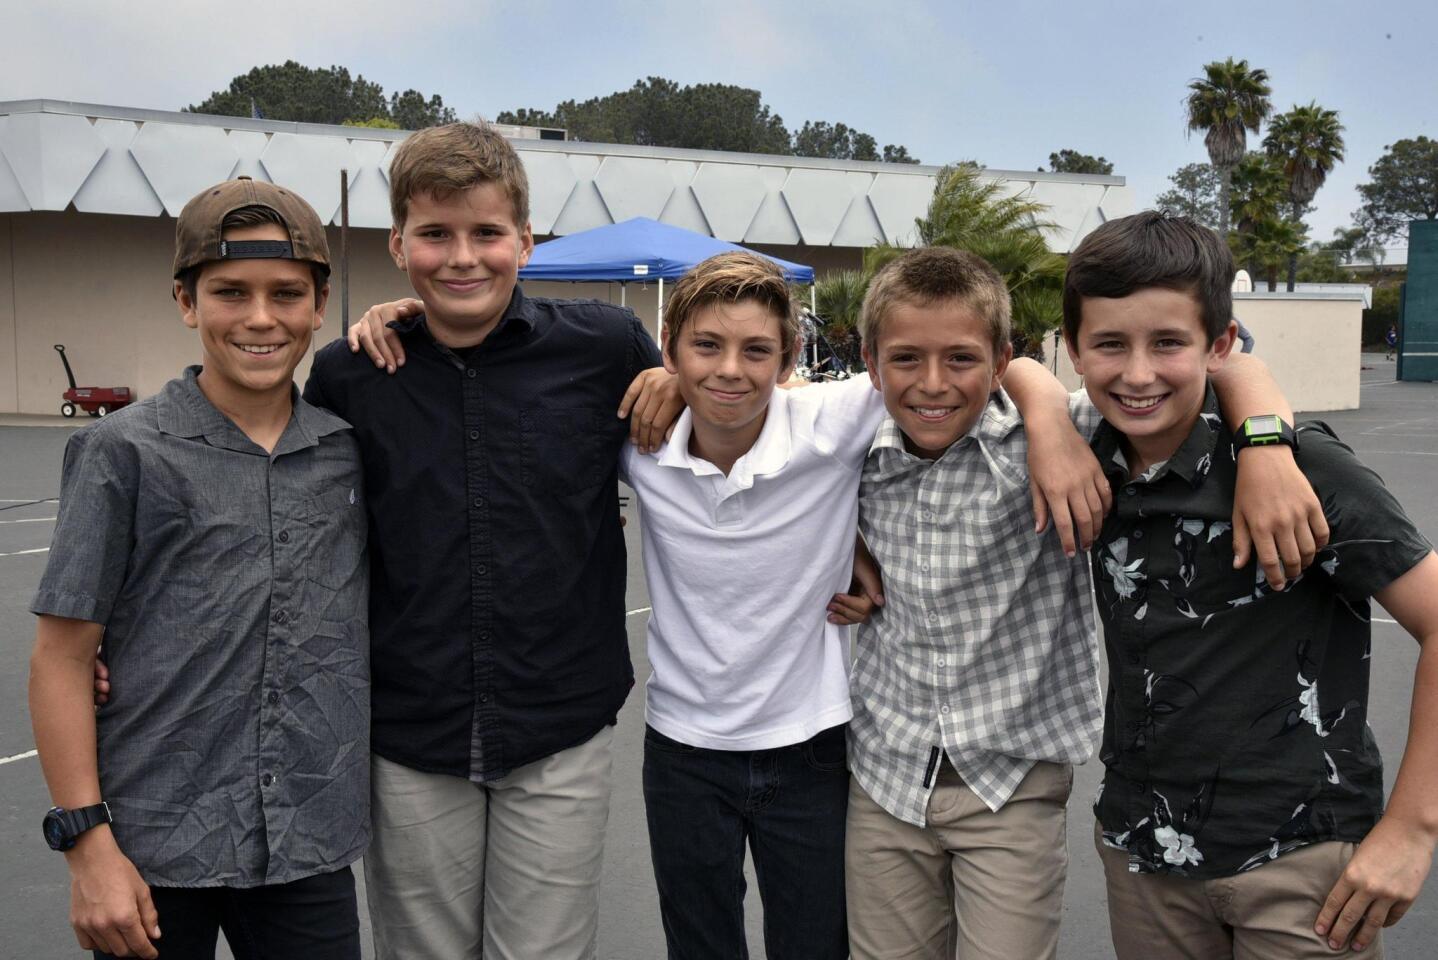 Nic, Jack, Santiago, Emanuele, Waylon